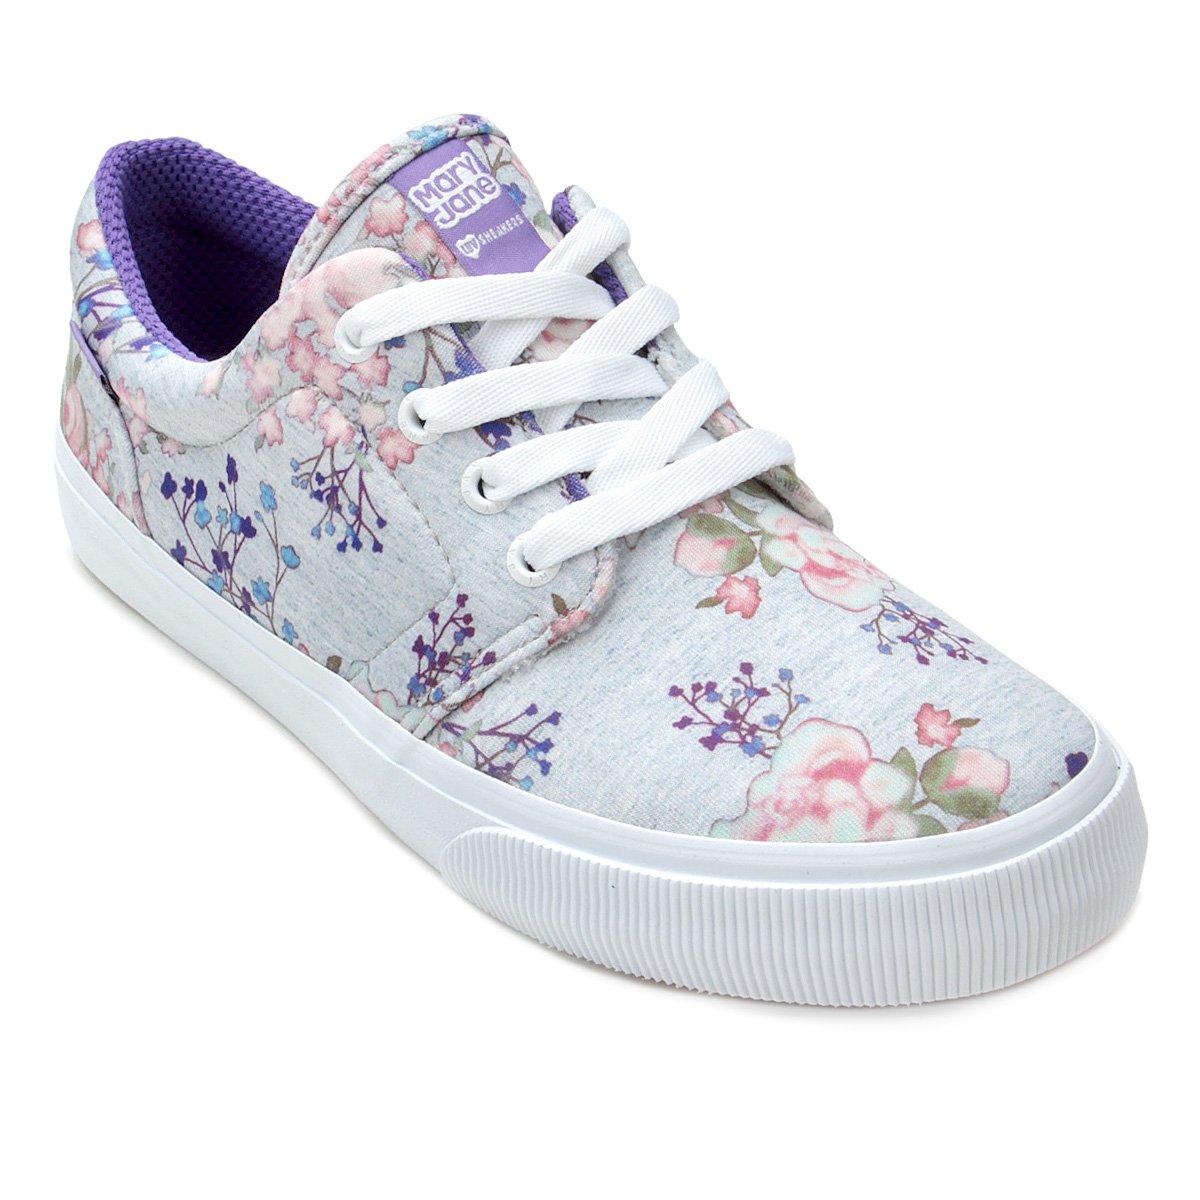 Tênis Mary Jane Blogger Flower Feminino - Cinza - Compre Agora ... 65854ffee2f